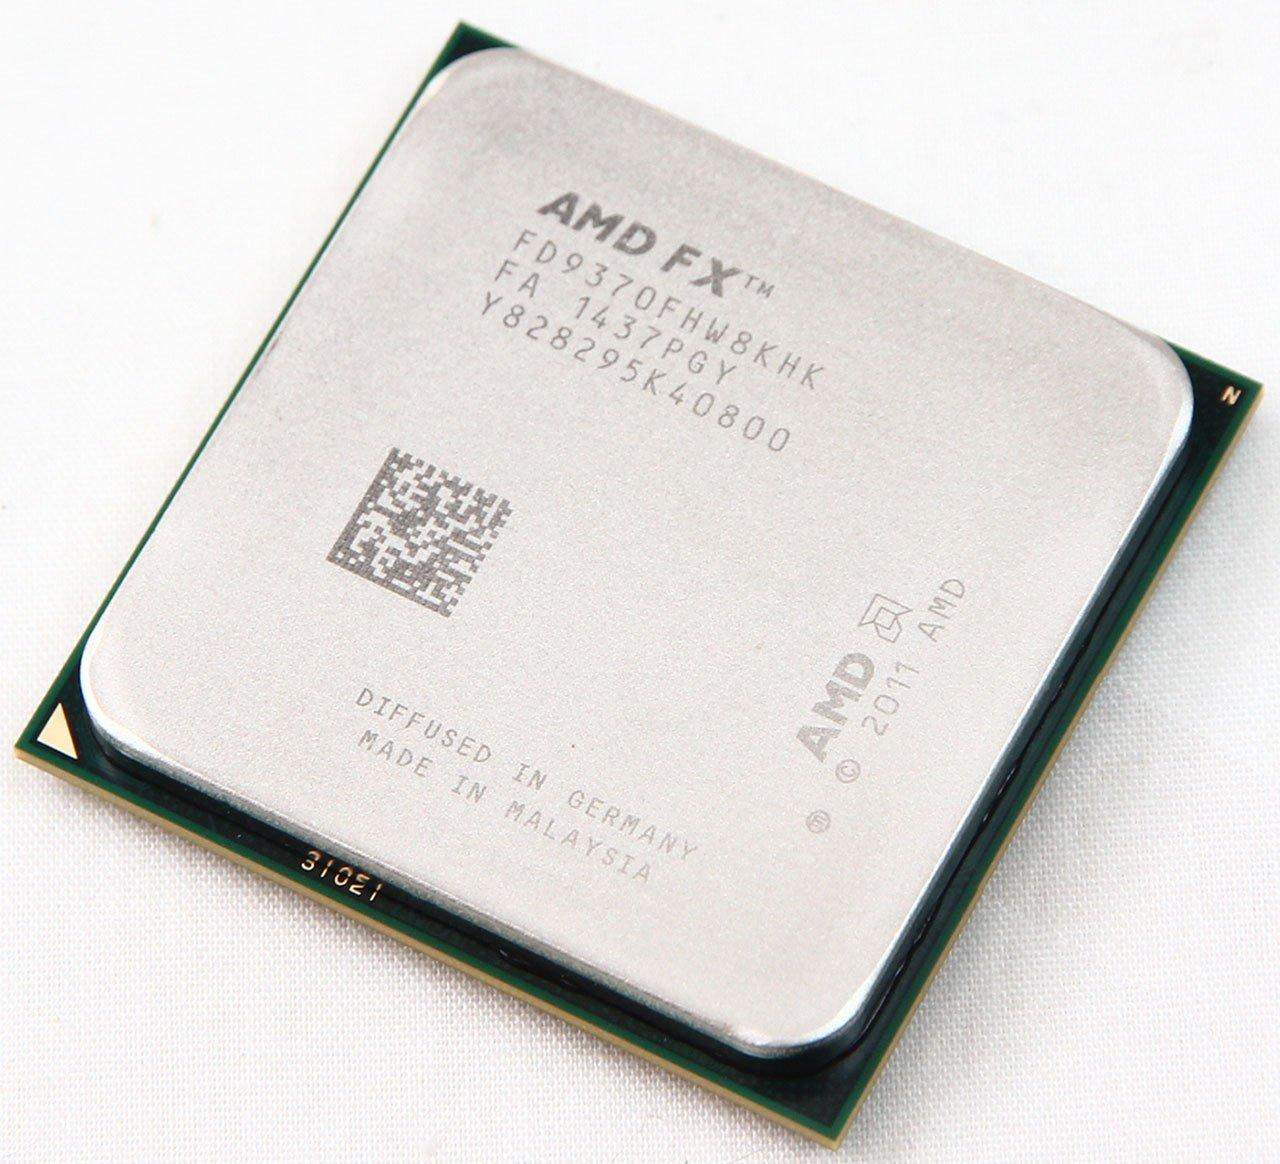 AMD FX-9370 (Vishera) 8-Core Processor Review 5